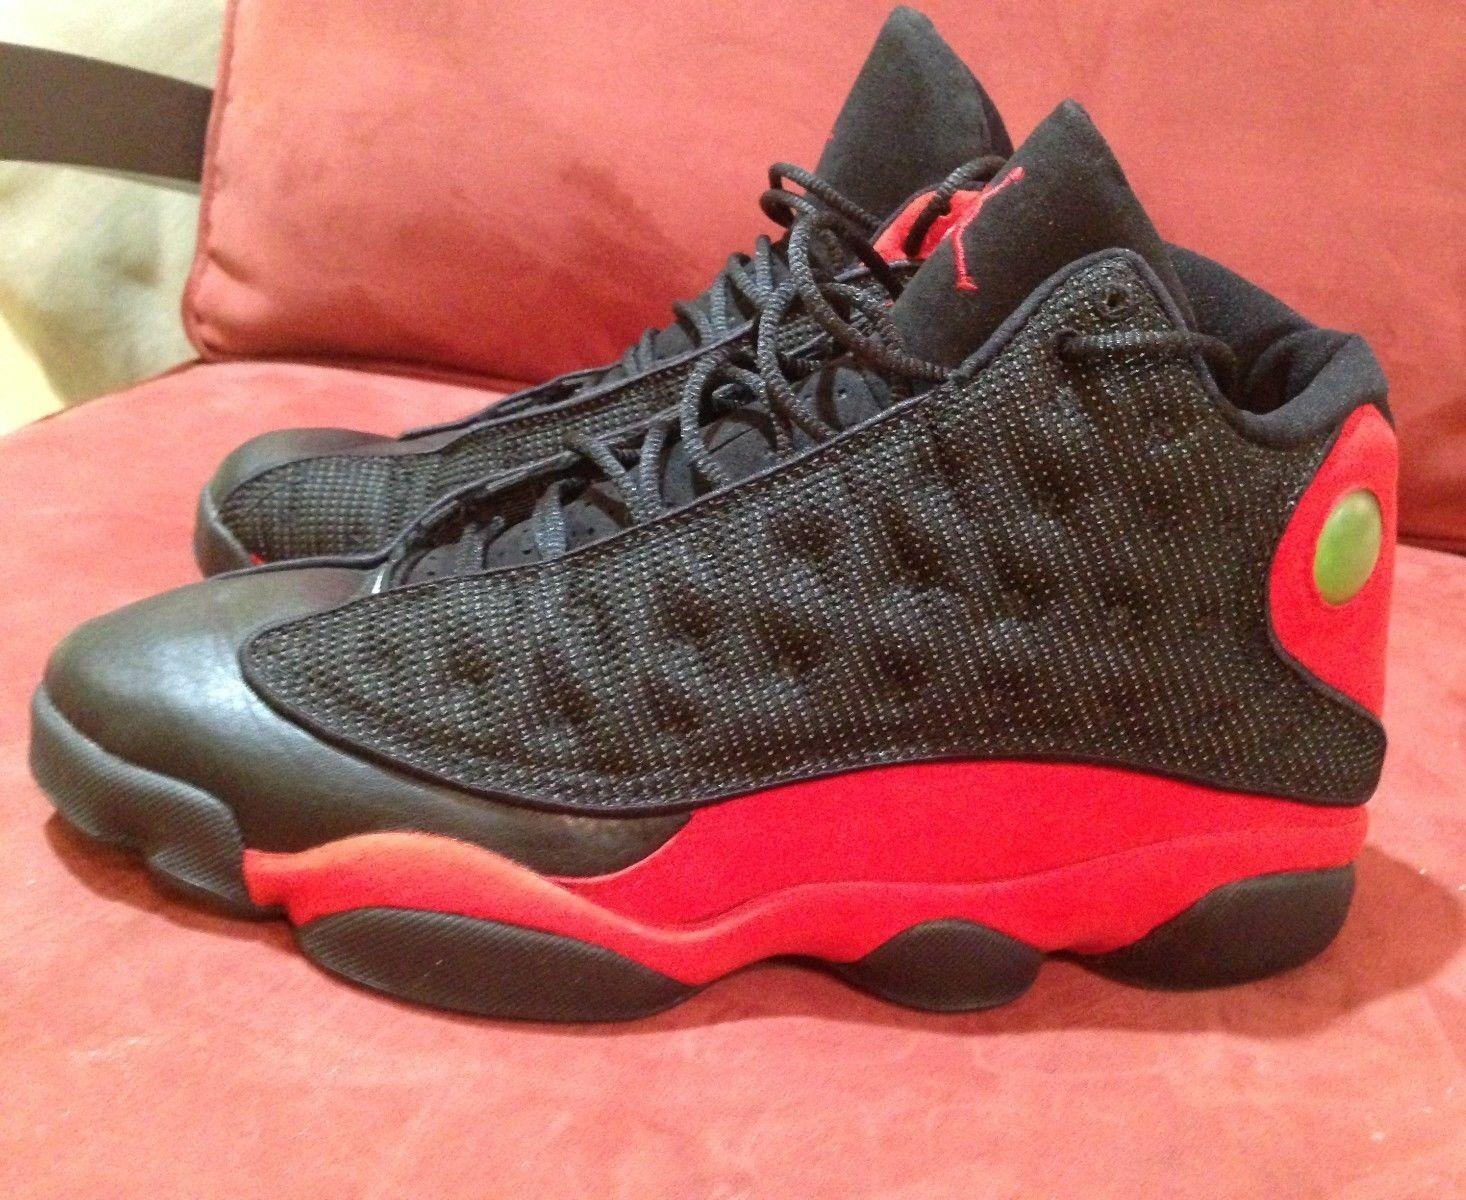 Nike air jordan 13 (xiii) og 1998, c (nero / vero rosso) taglia 10 fede!